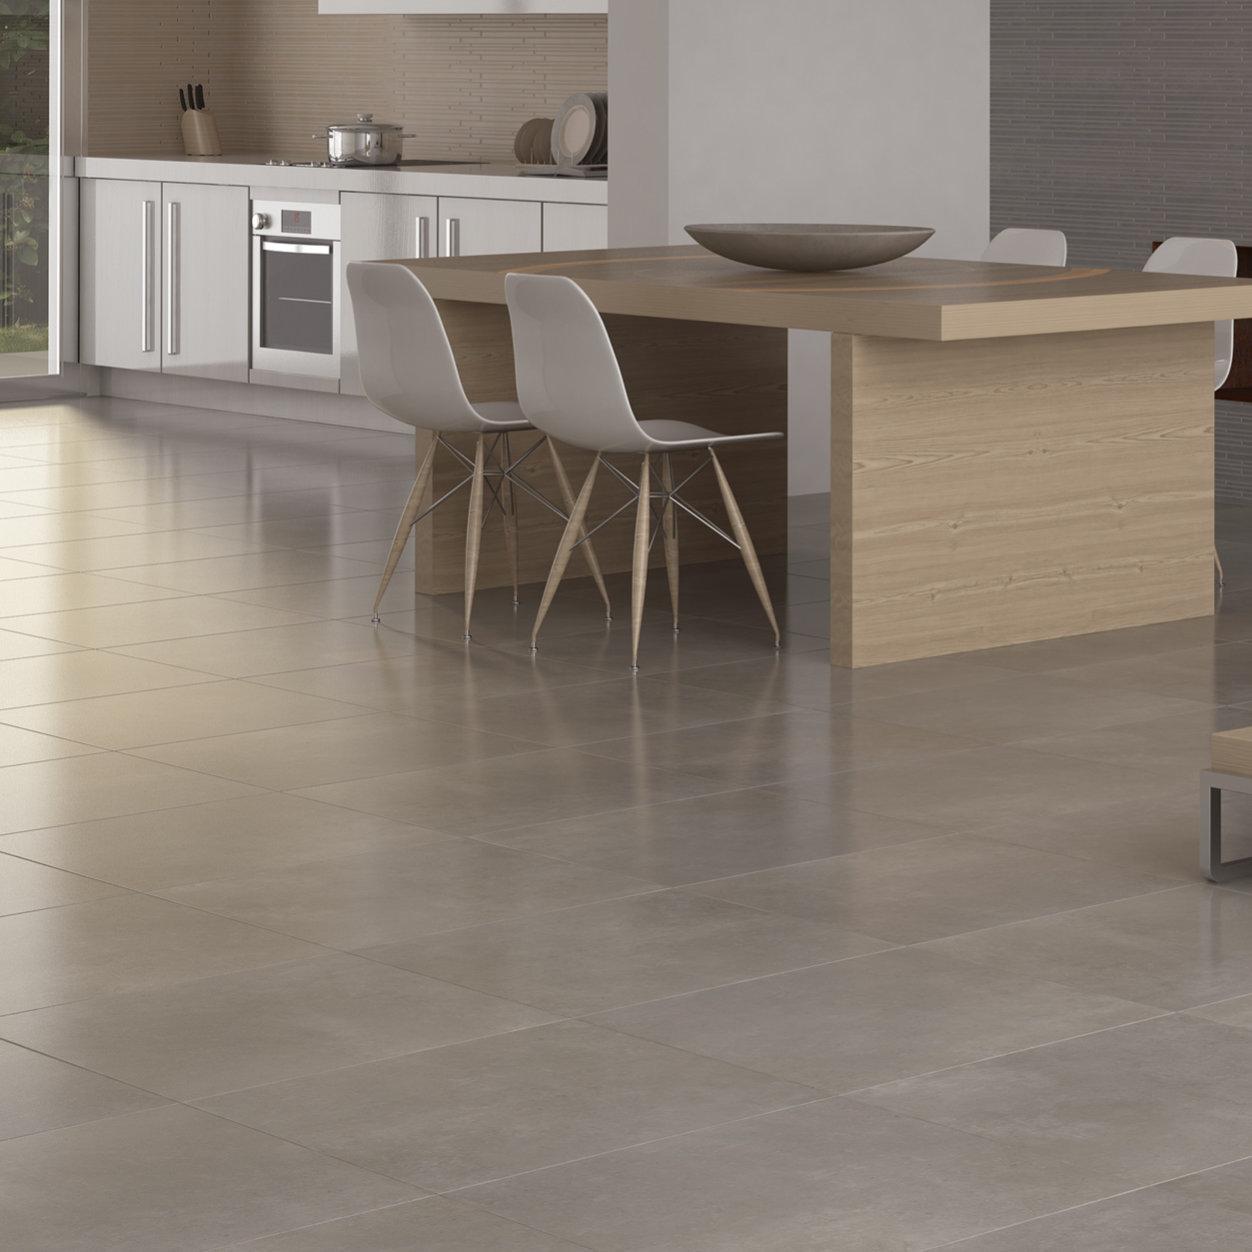 Grand Canyon Floor Ceramic Tiles